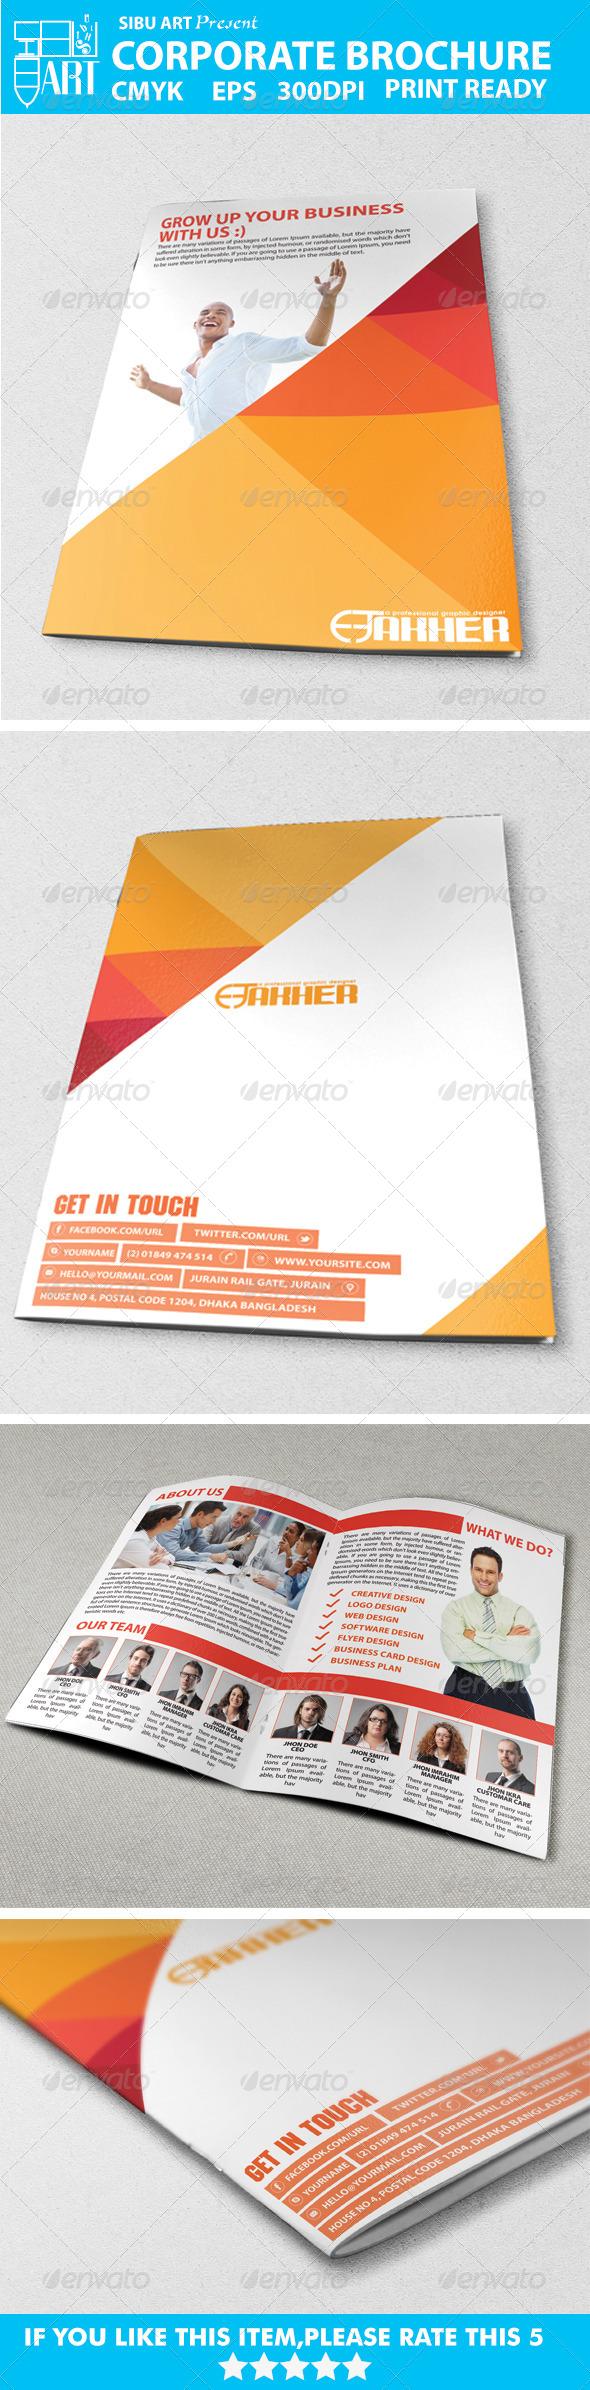 GraphicRiver Corporate Brochures VOl-001 5730963